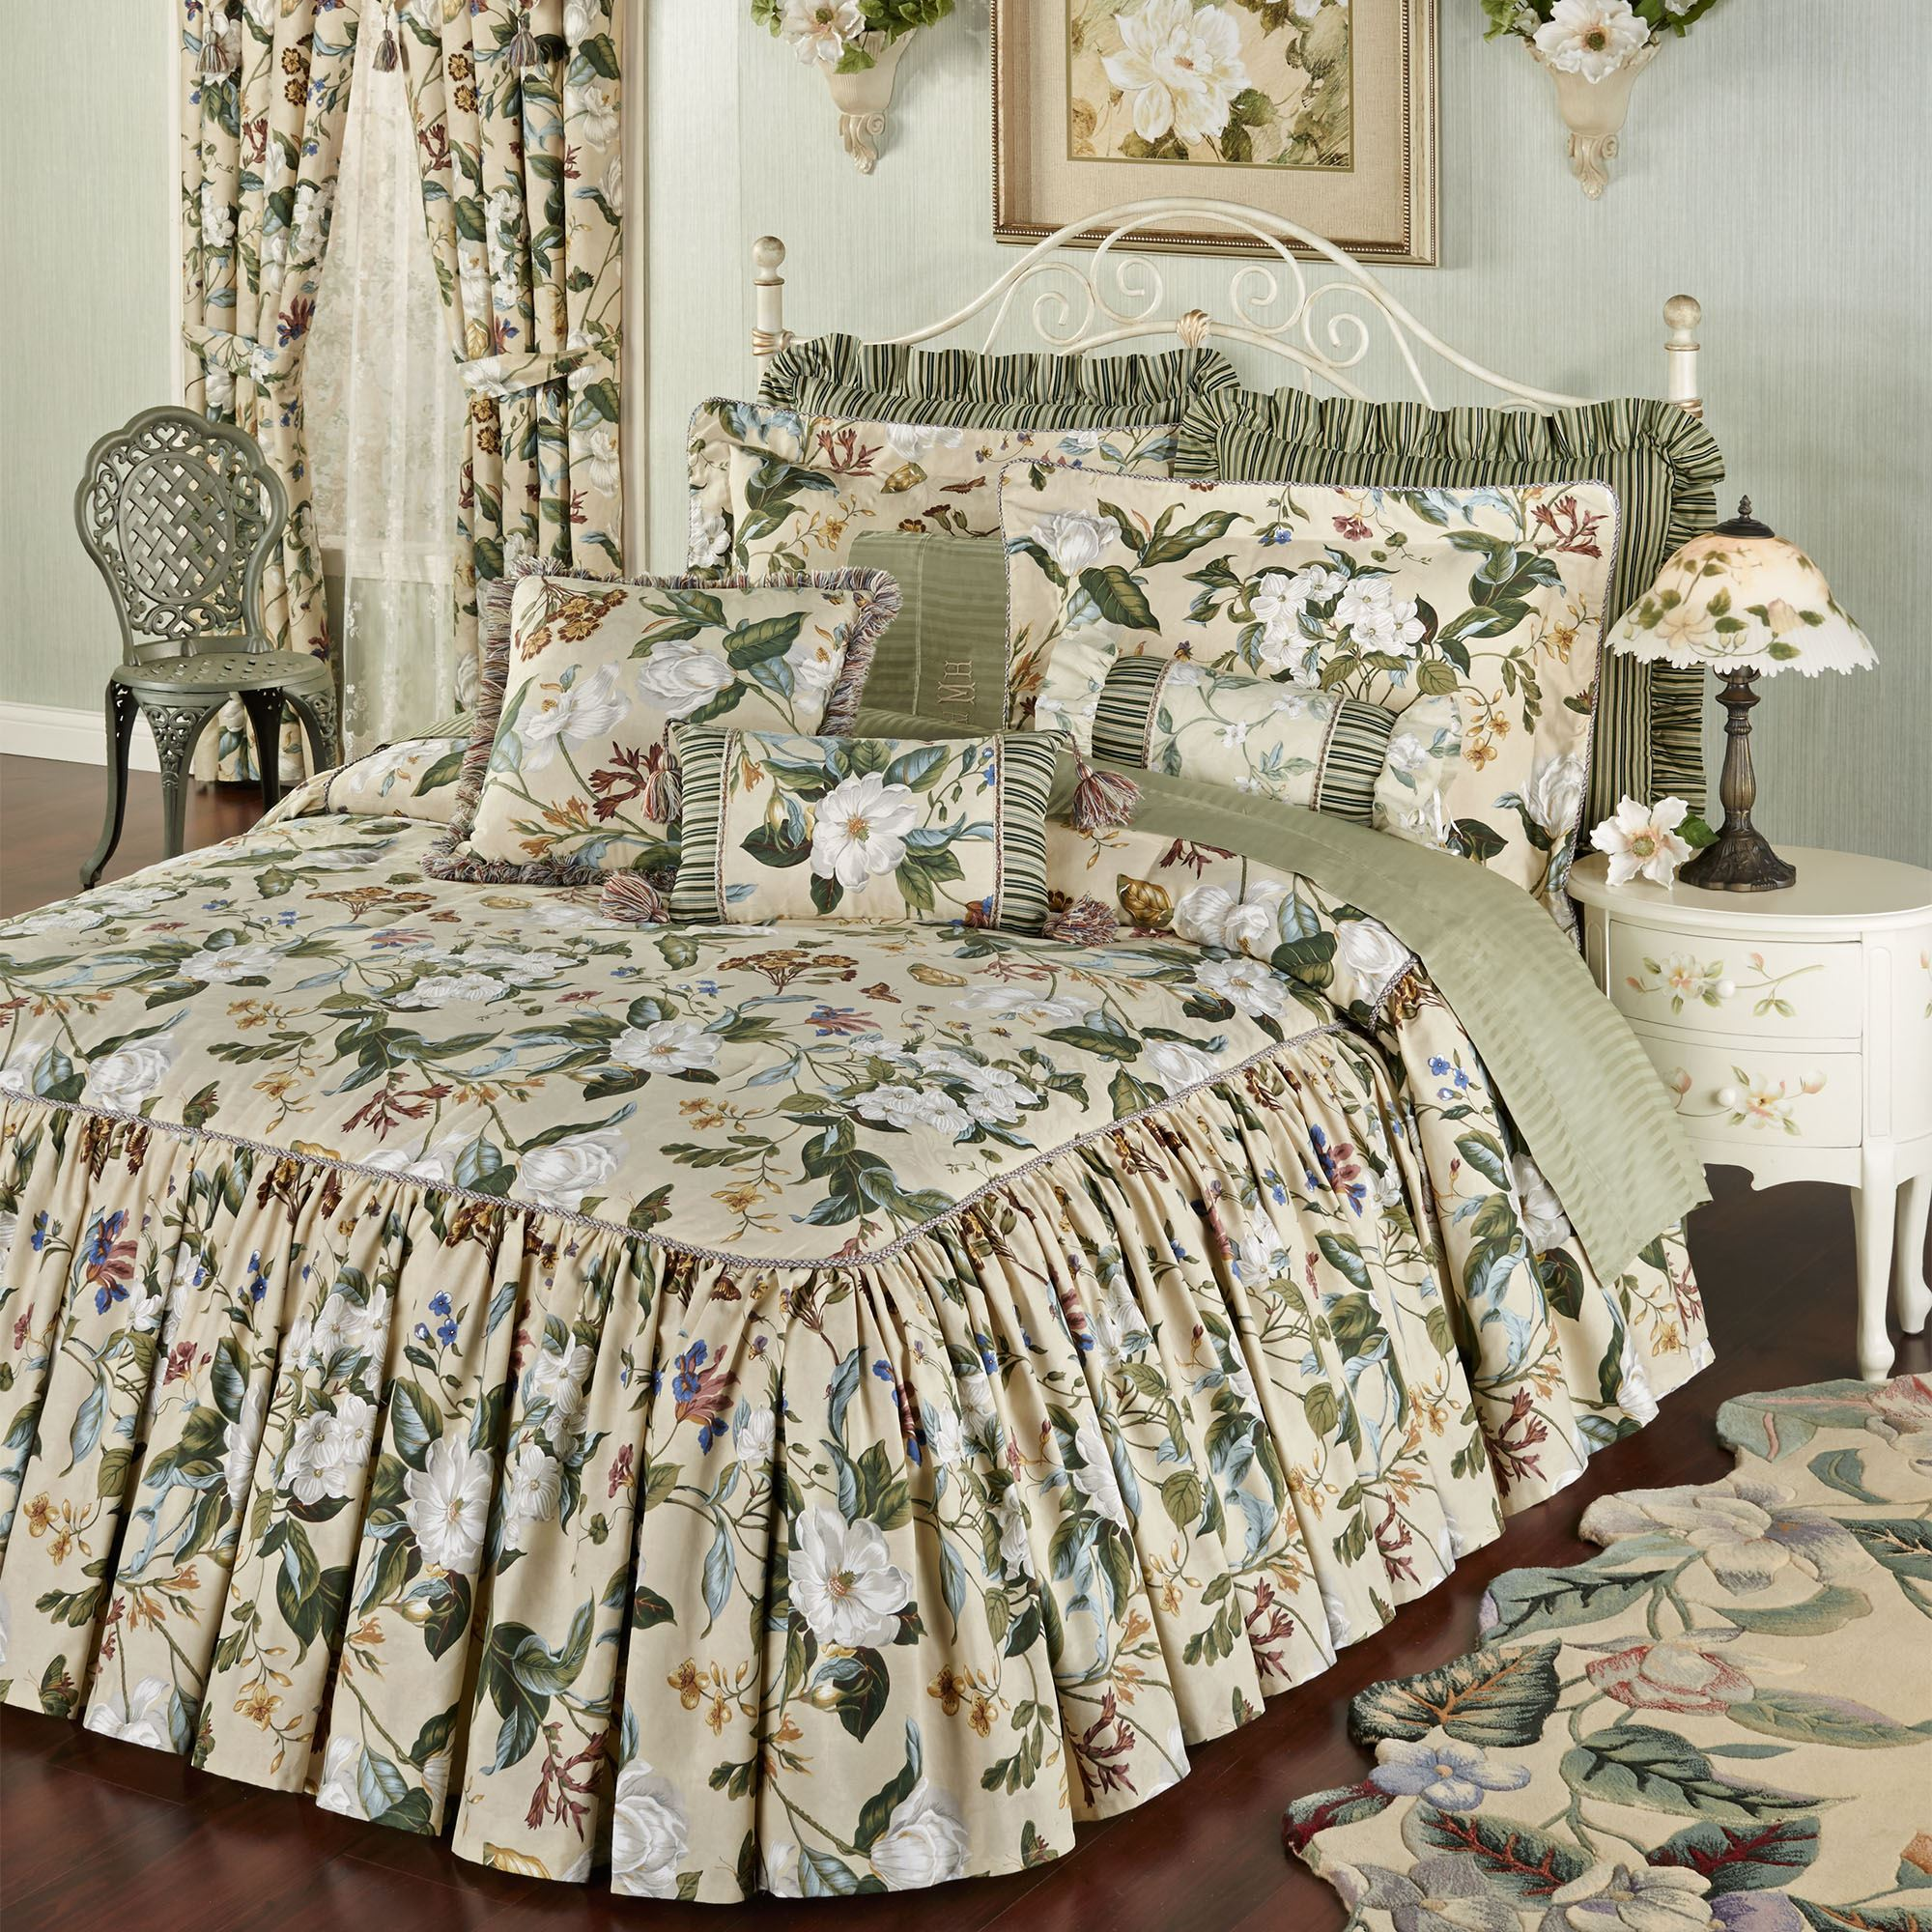 Garden Images Iii Magnolia Floral Ruffled Flounce Bedspread